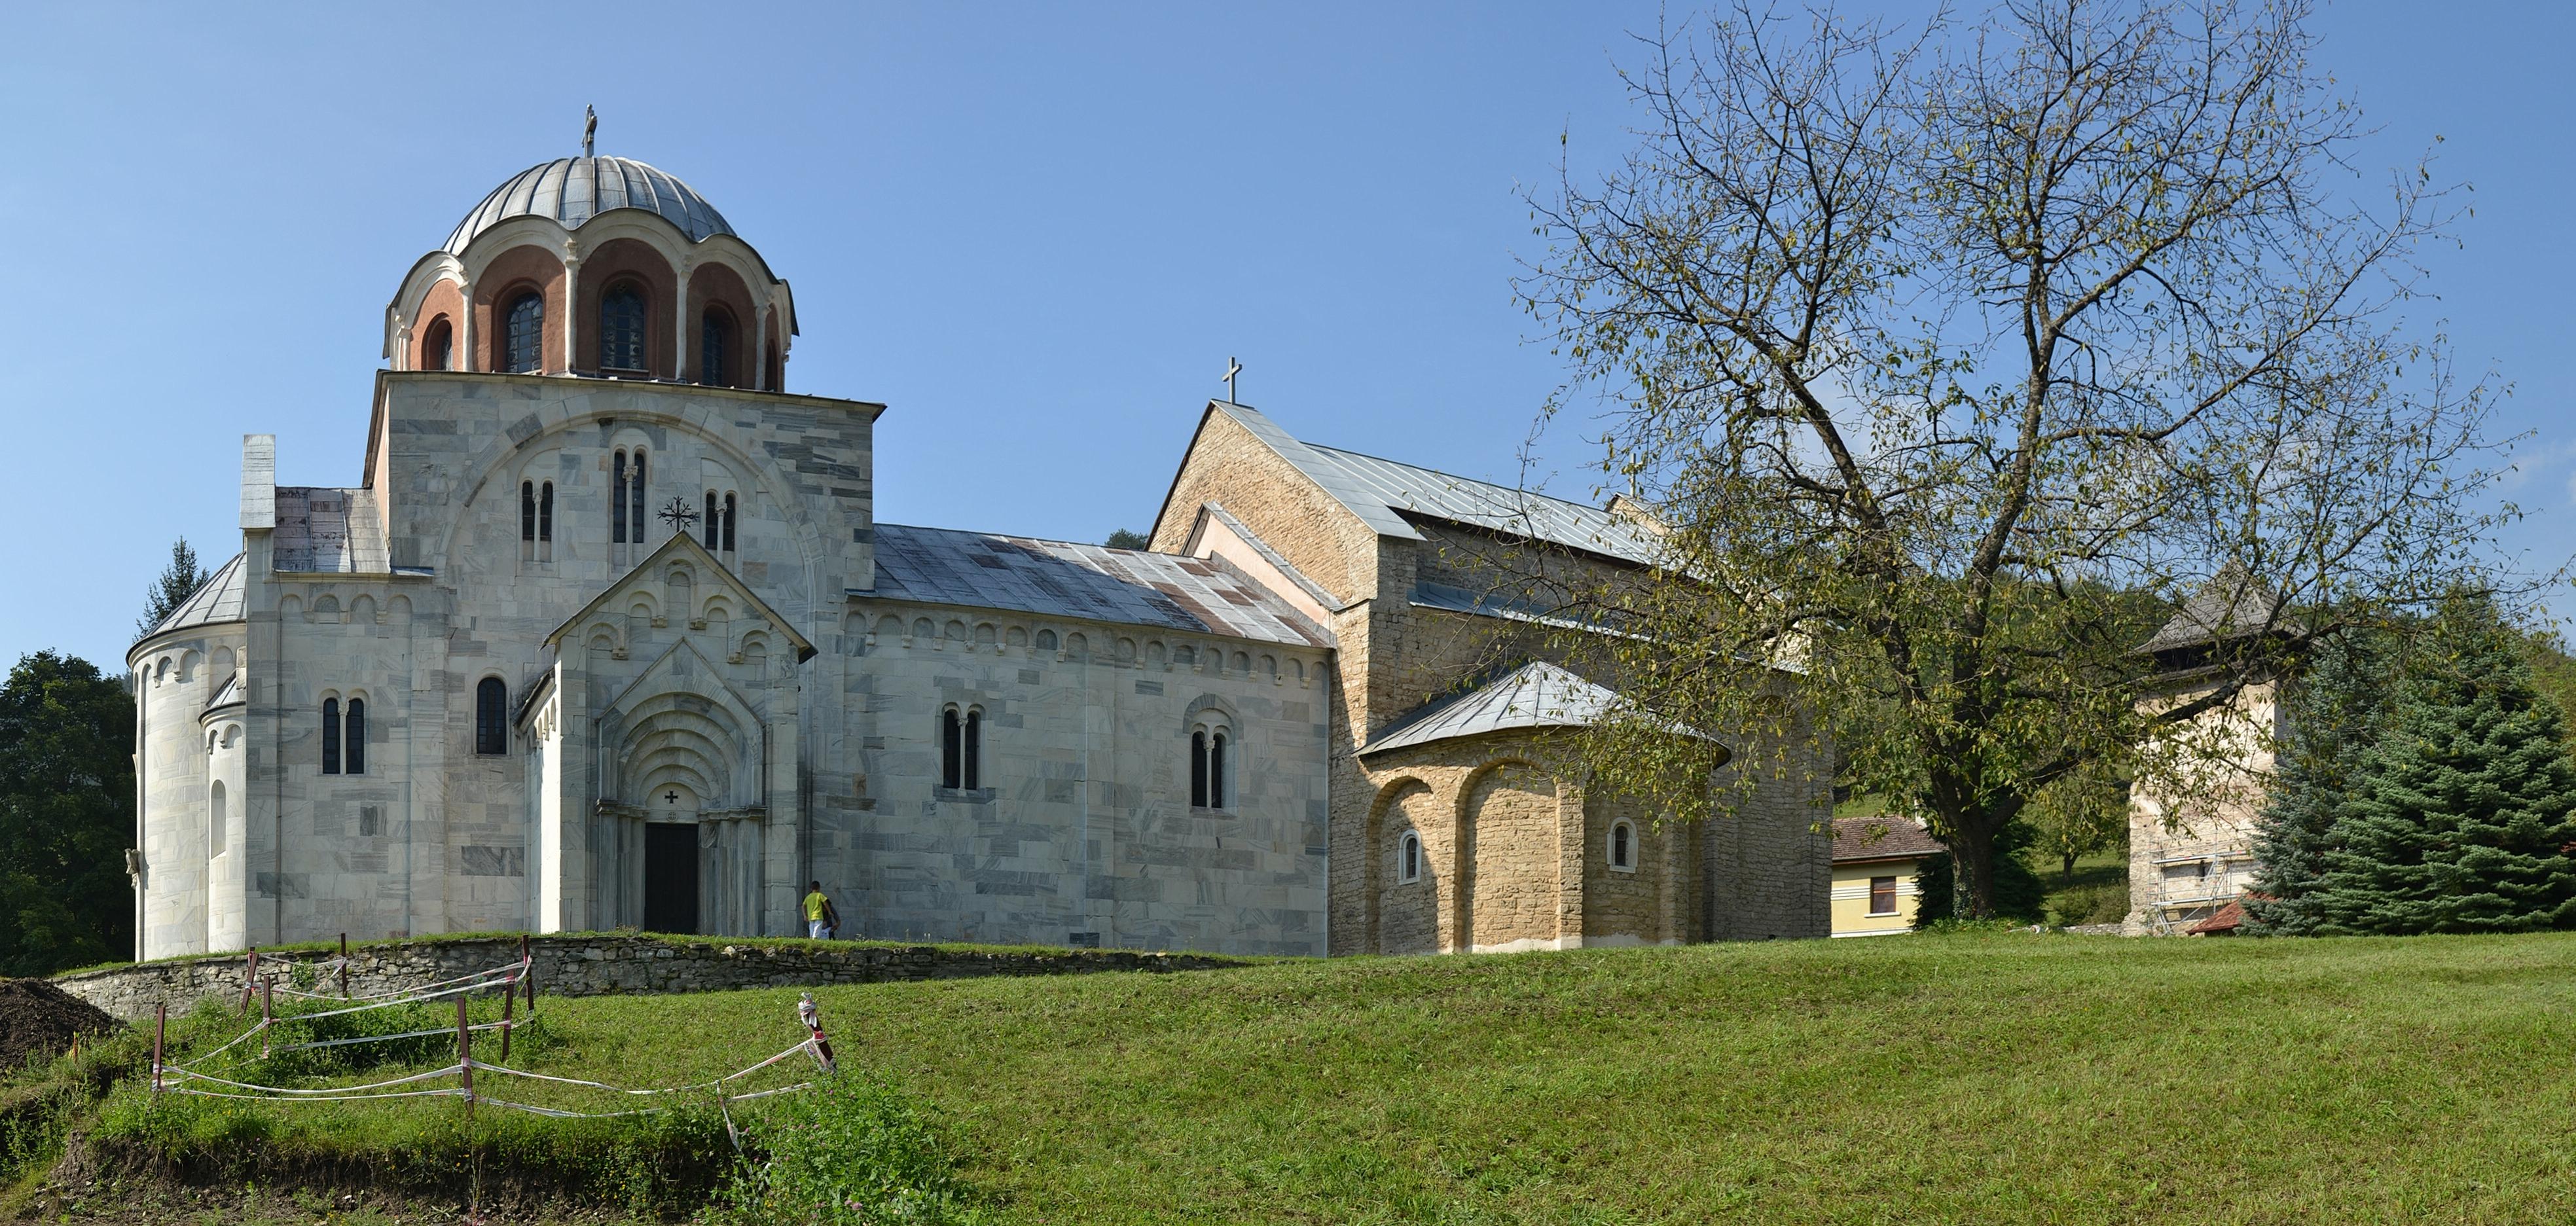 Monastier Studenica, pamiatka Svetového dedičstva UNESCO v Srbsku. Foto: Marcin Szala (Wikimedia Commons)